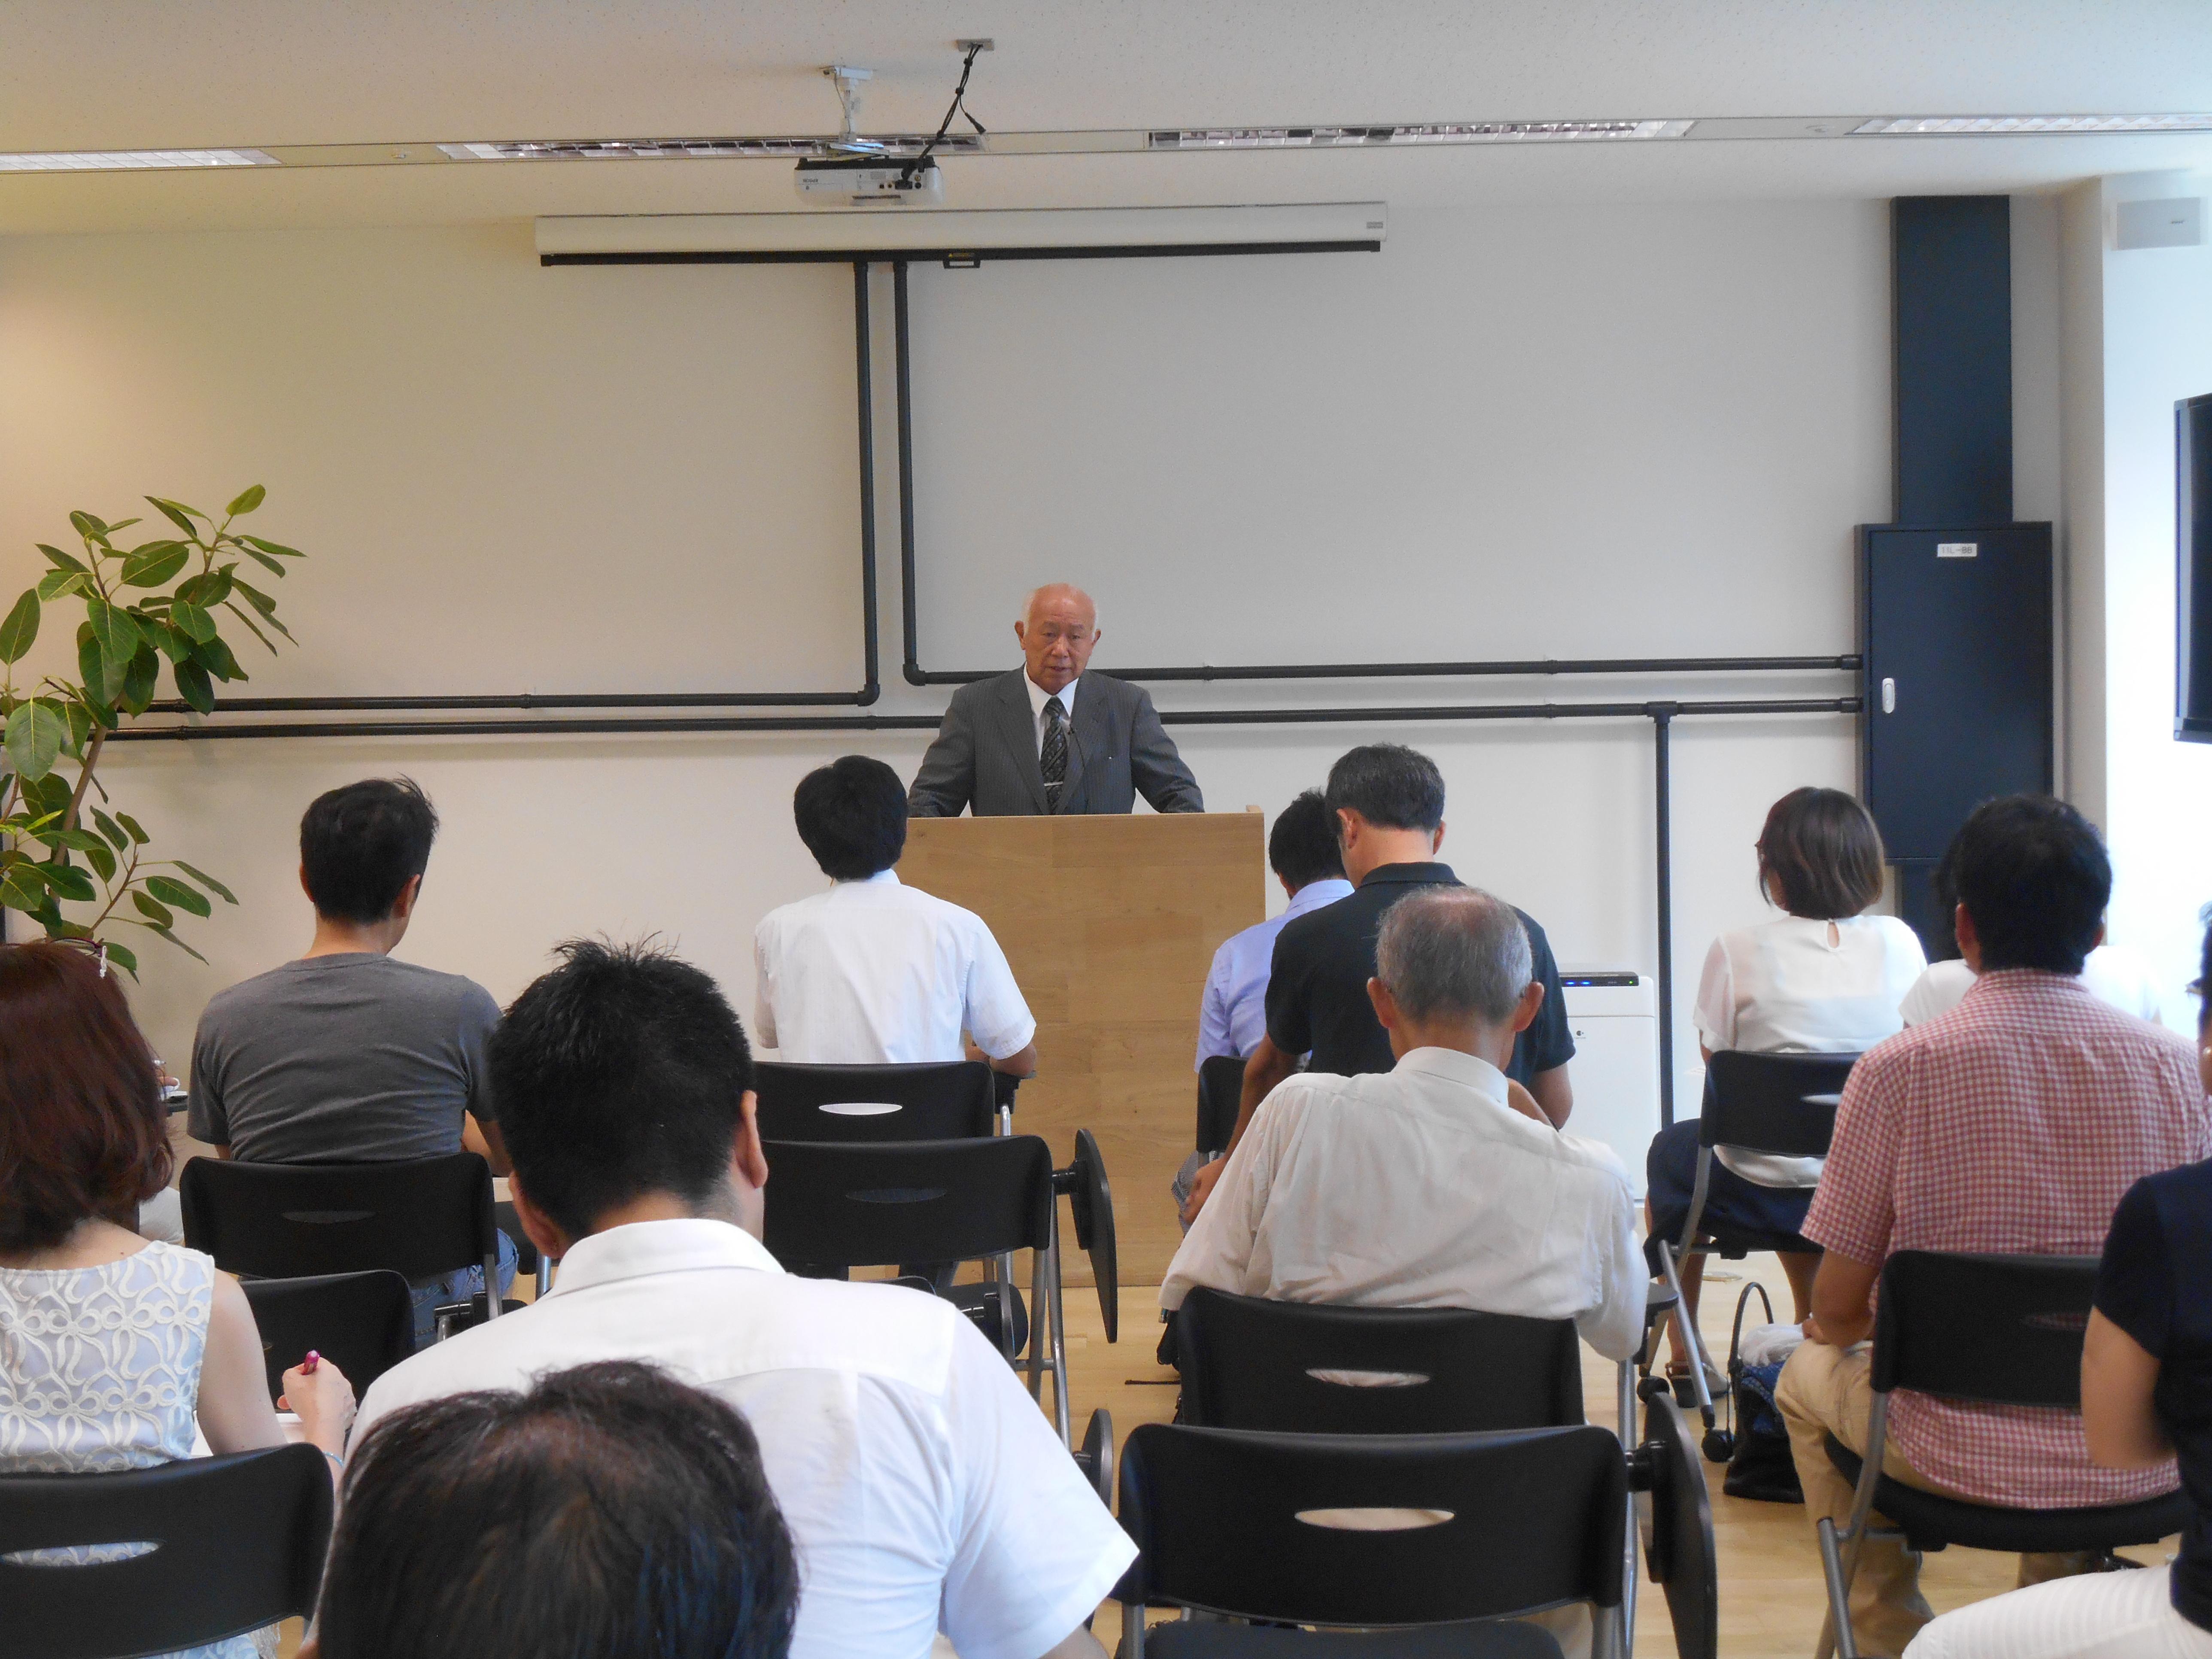 DSCN4956 - 2017年2月4日東京思風塾開催